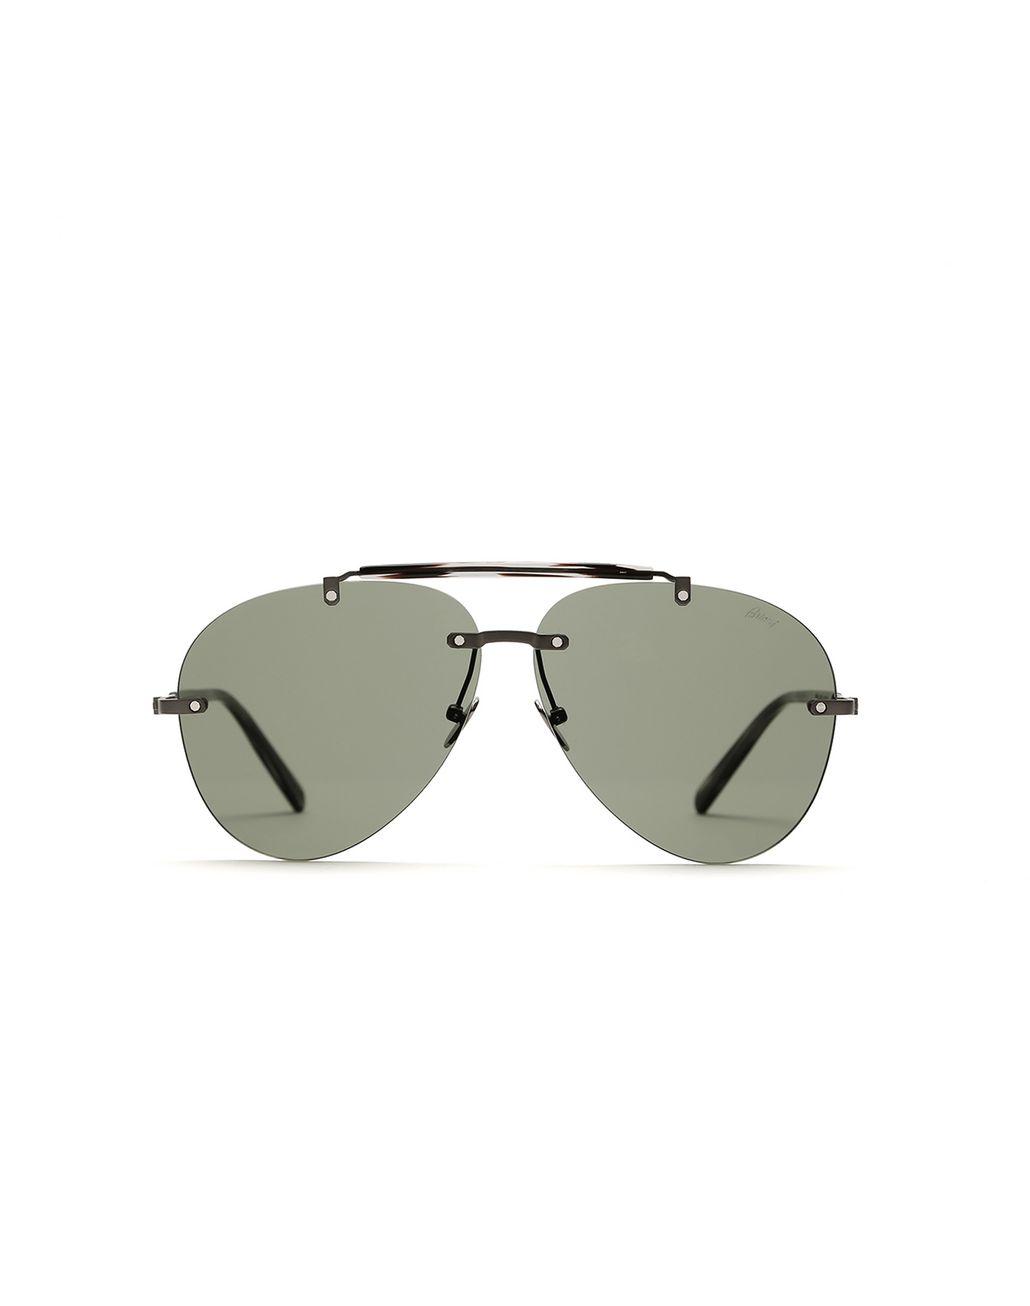 BRIONI Green Pilot Sunglasses With Green Lenses Sunglasses Man f